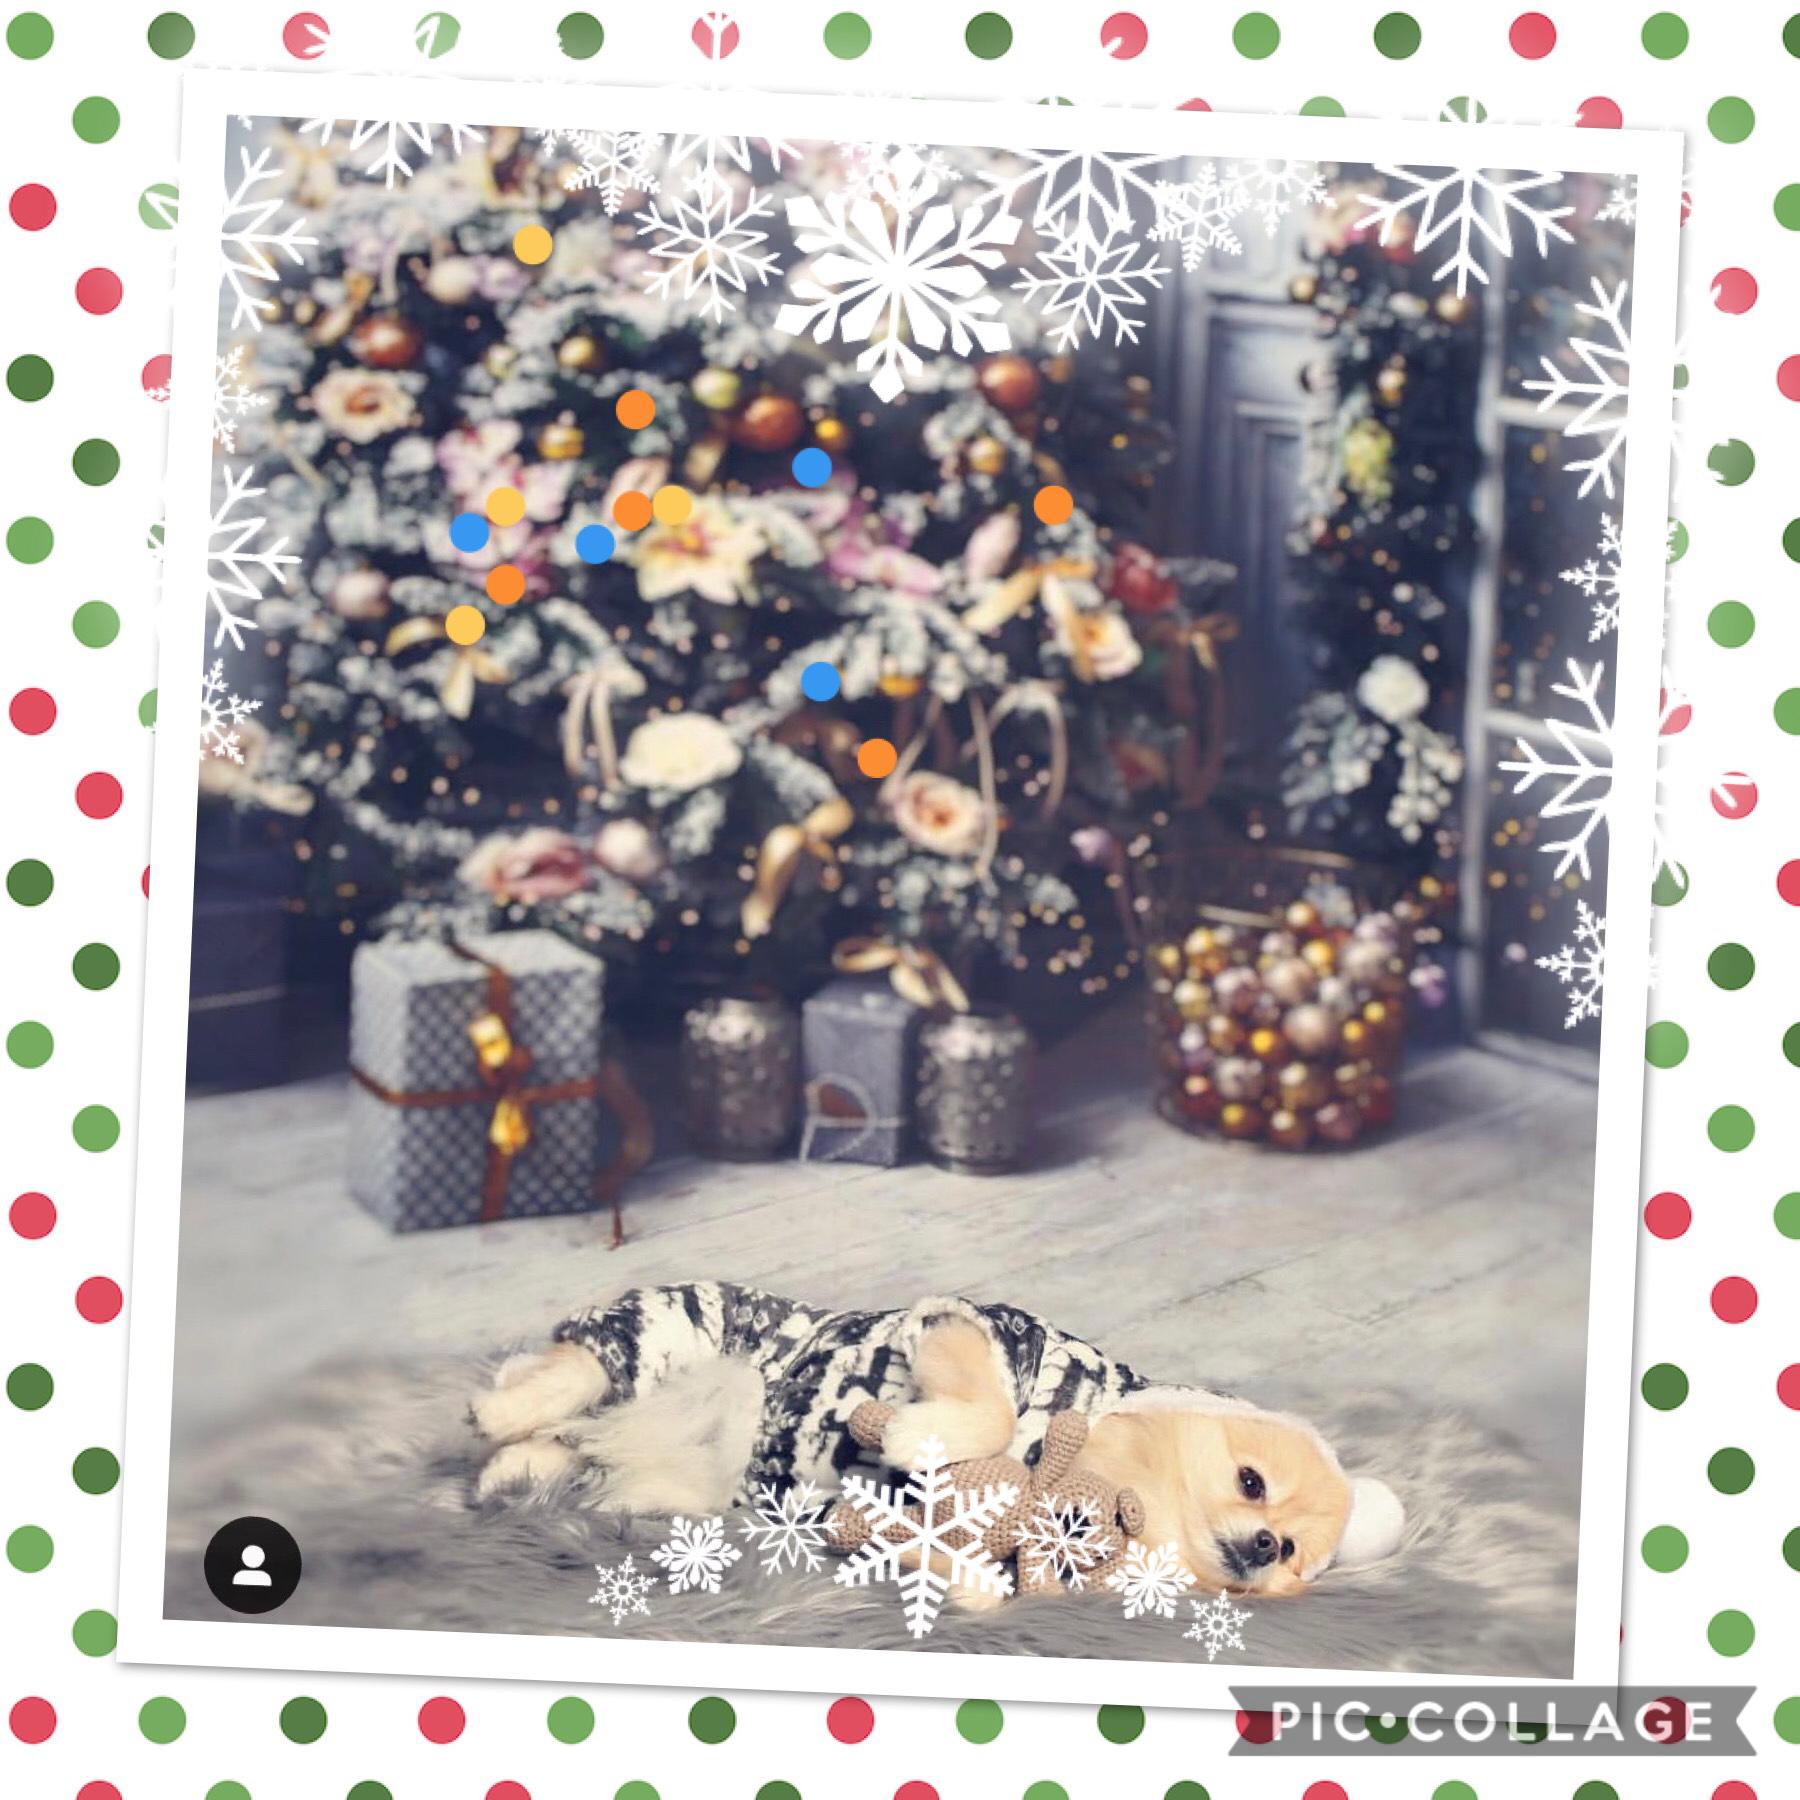 Do pets celebrate the holidays too 🧐